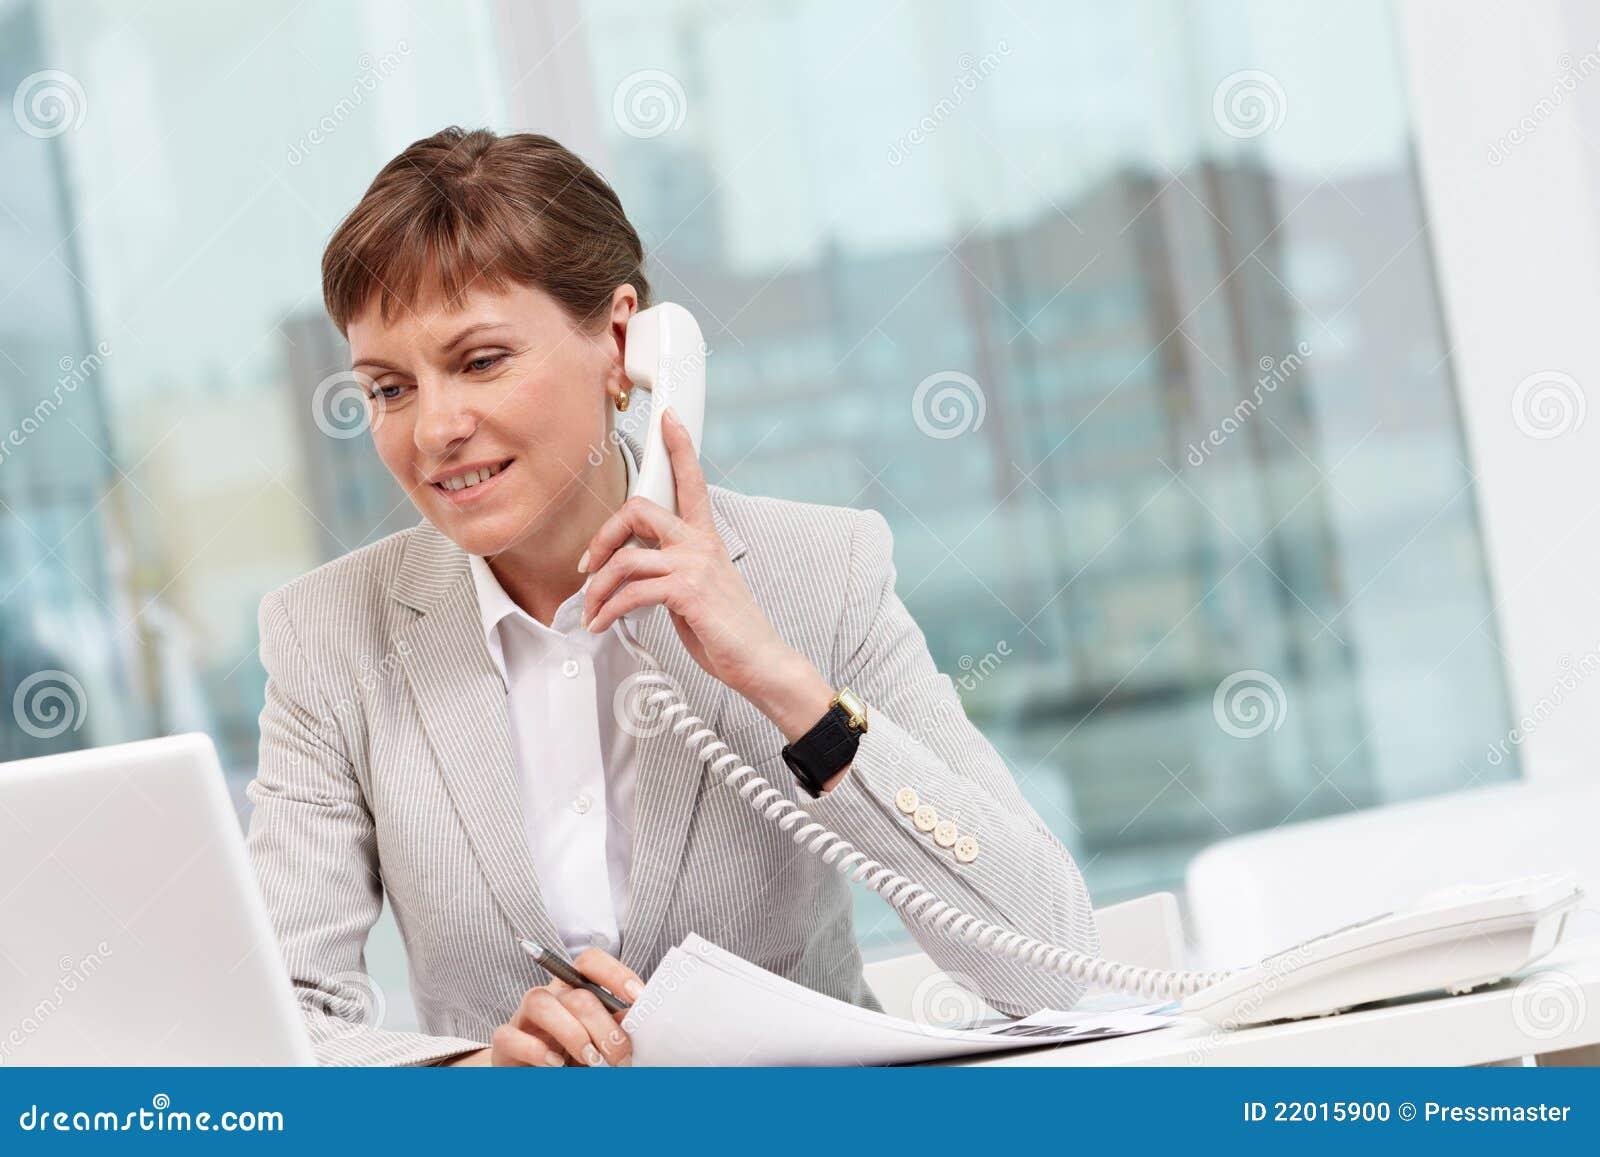 FREE 15 MINUTE SKYPE/ZOOM/TELEPHONE CONSULTATION WITH DR ... |Telephone Consultation